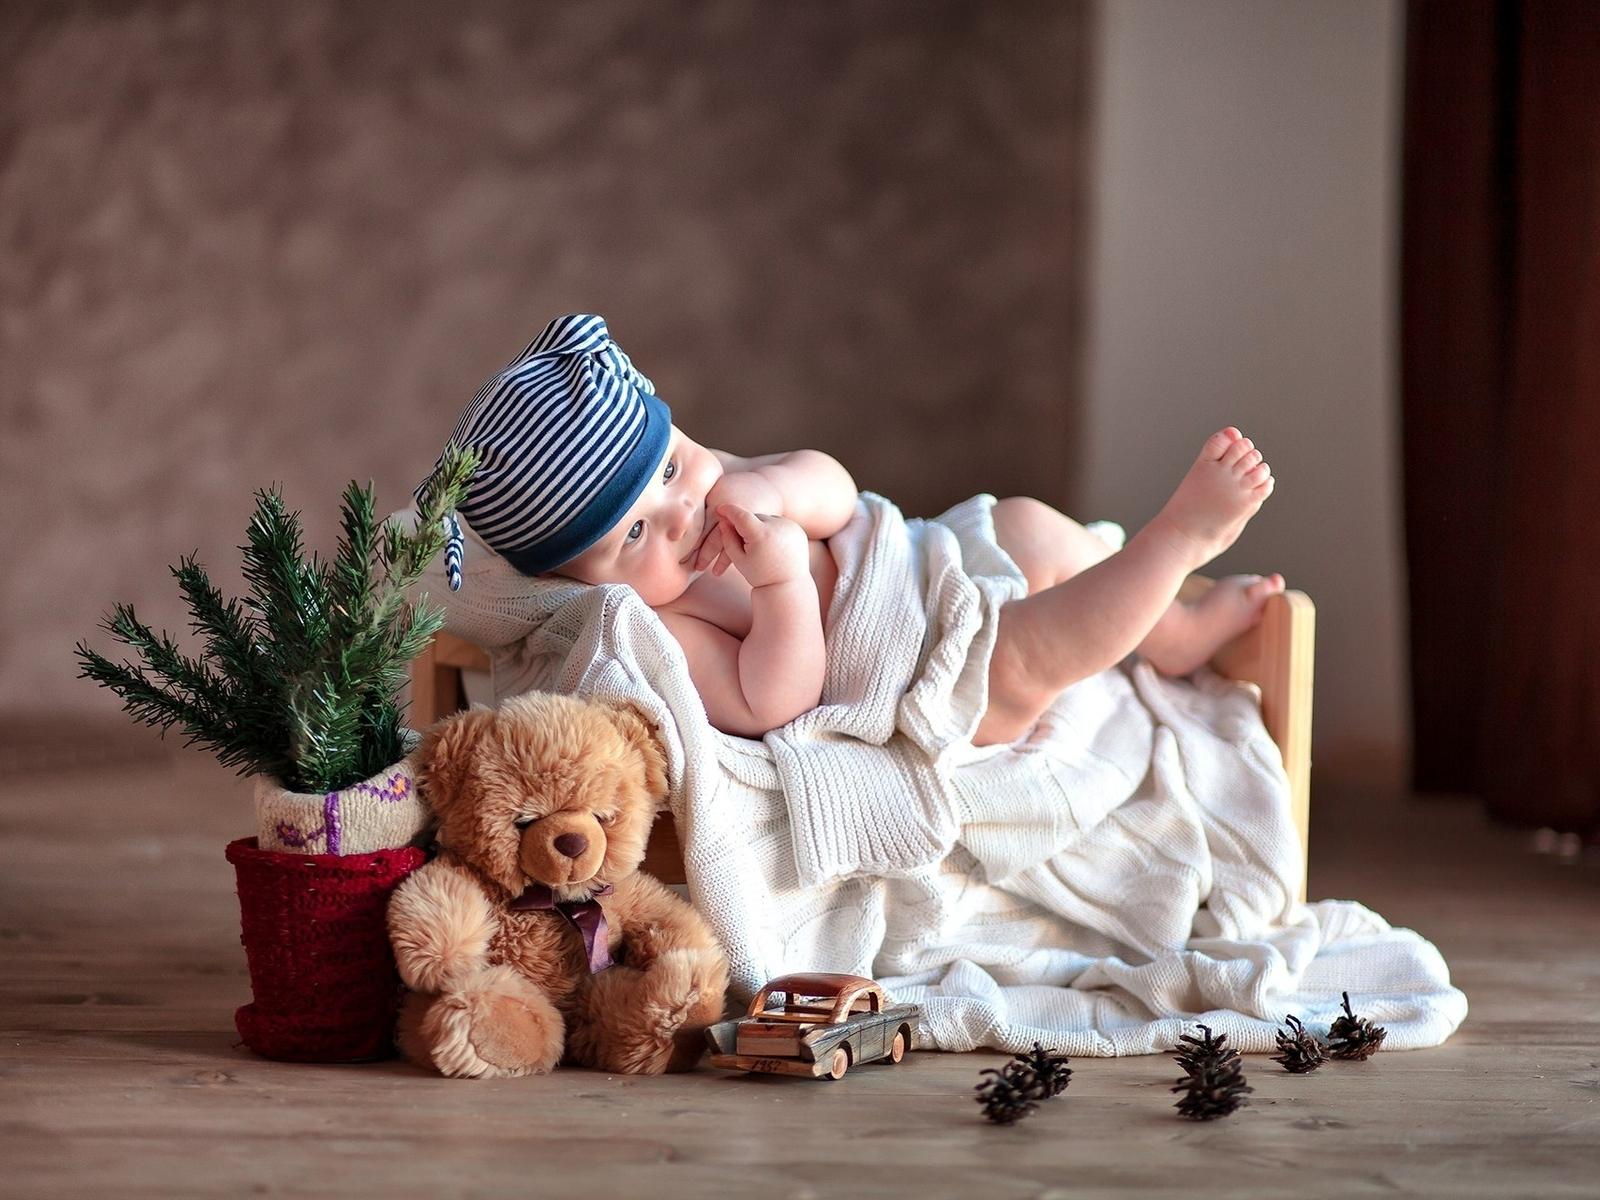 Image: Kid, child, toy, teddy bear, car, bumps